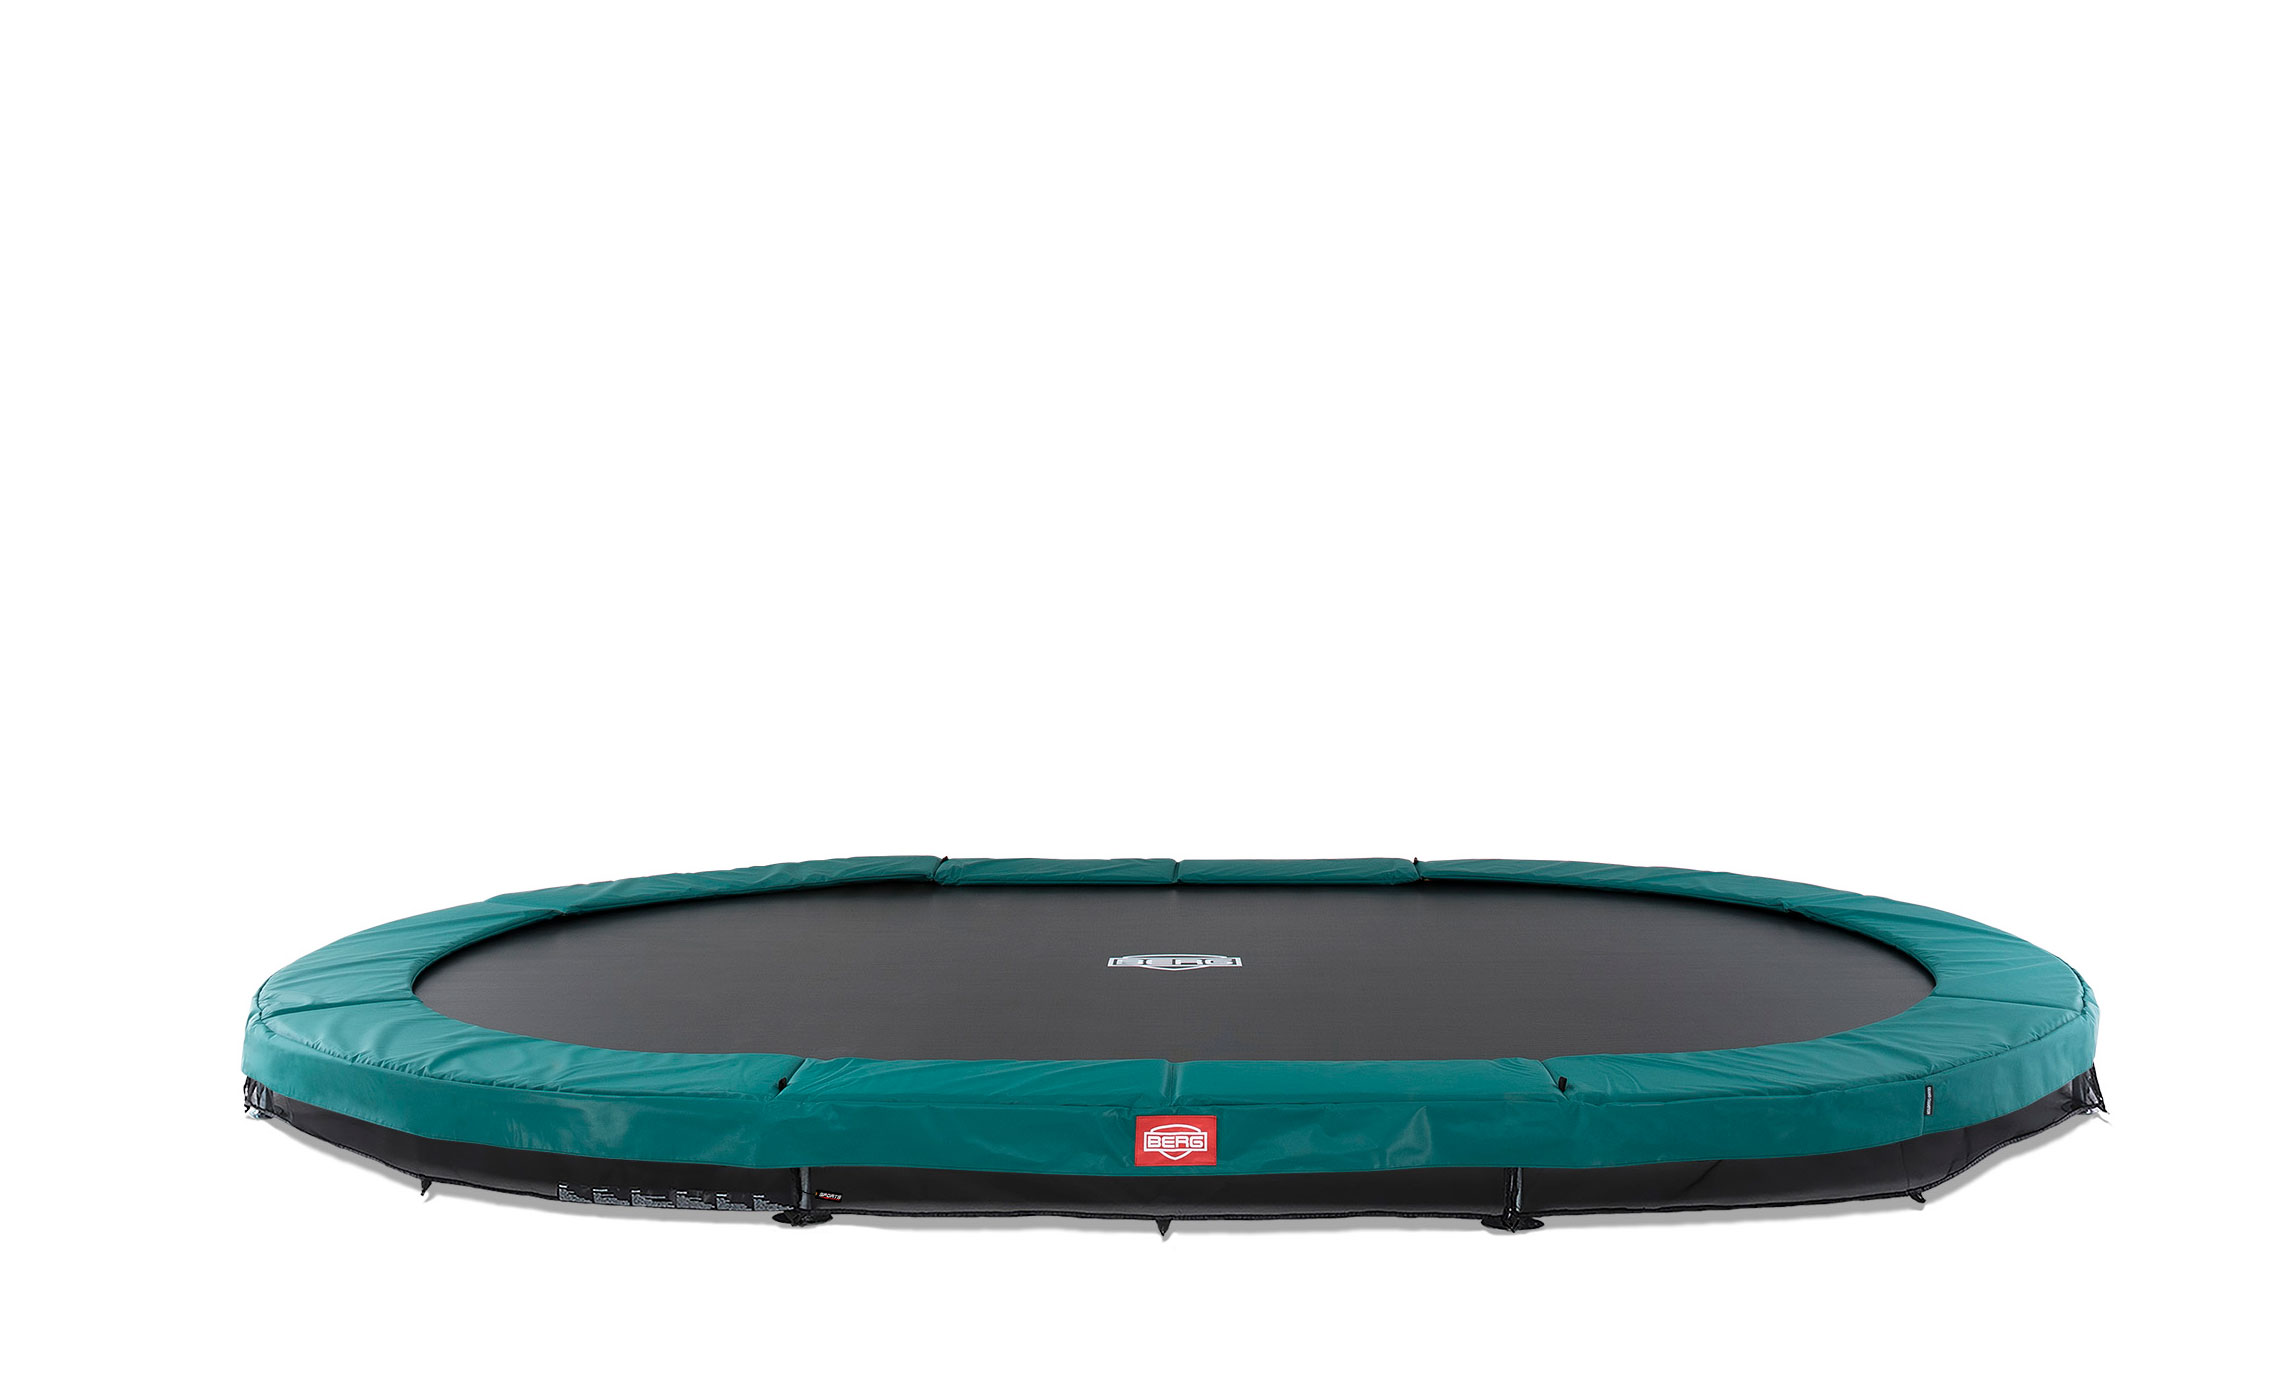 Trampolin Grand Champion InGround Sports grün 470x310cm BERG toys Bild 1